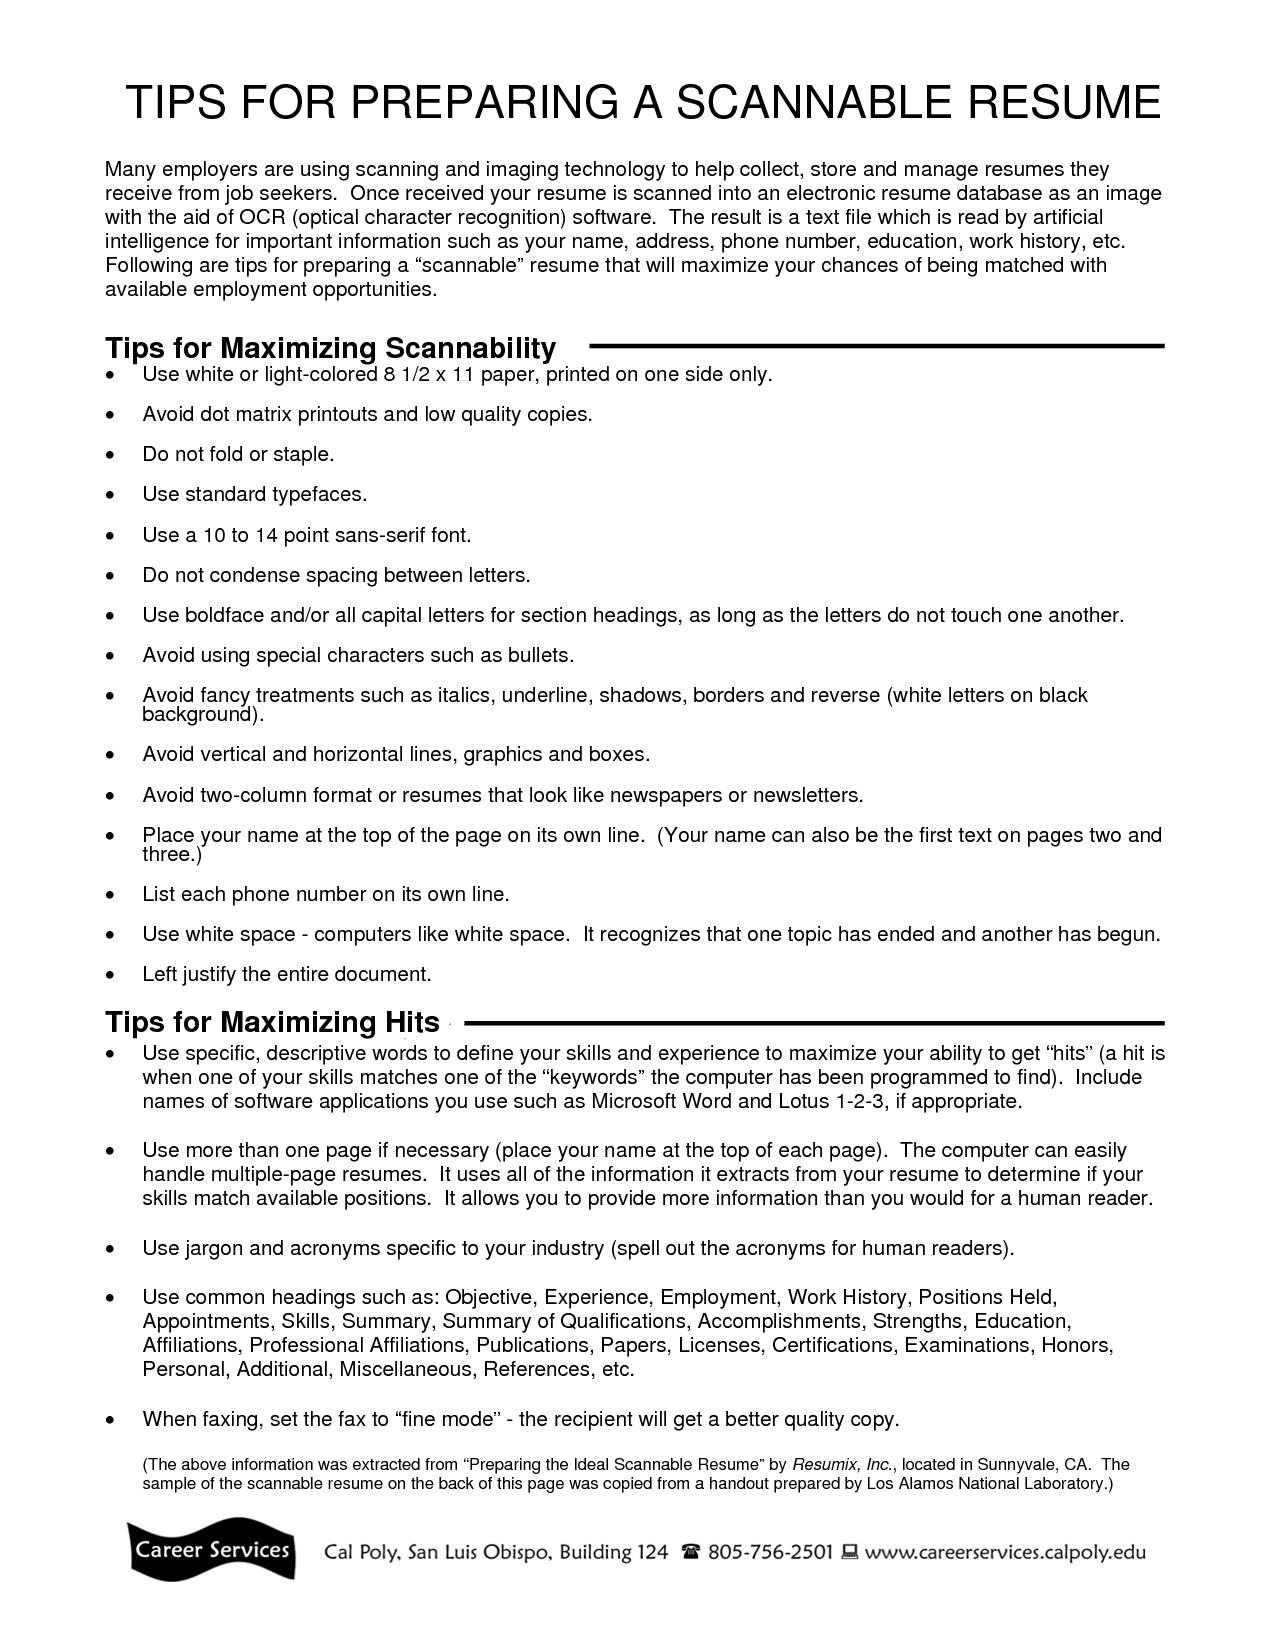 Best Scannable Resume format Resume format